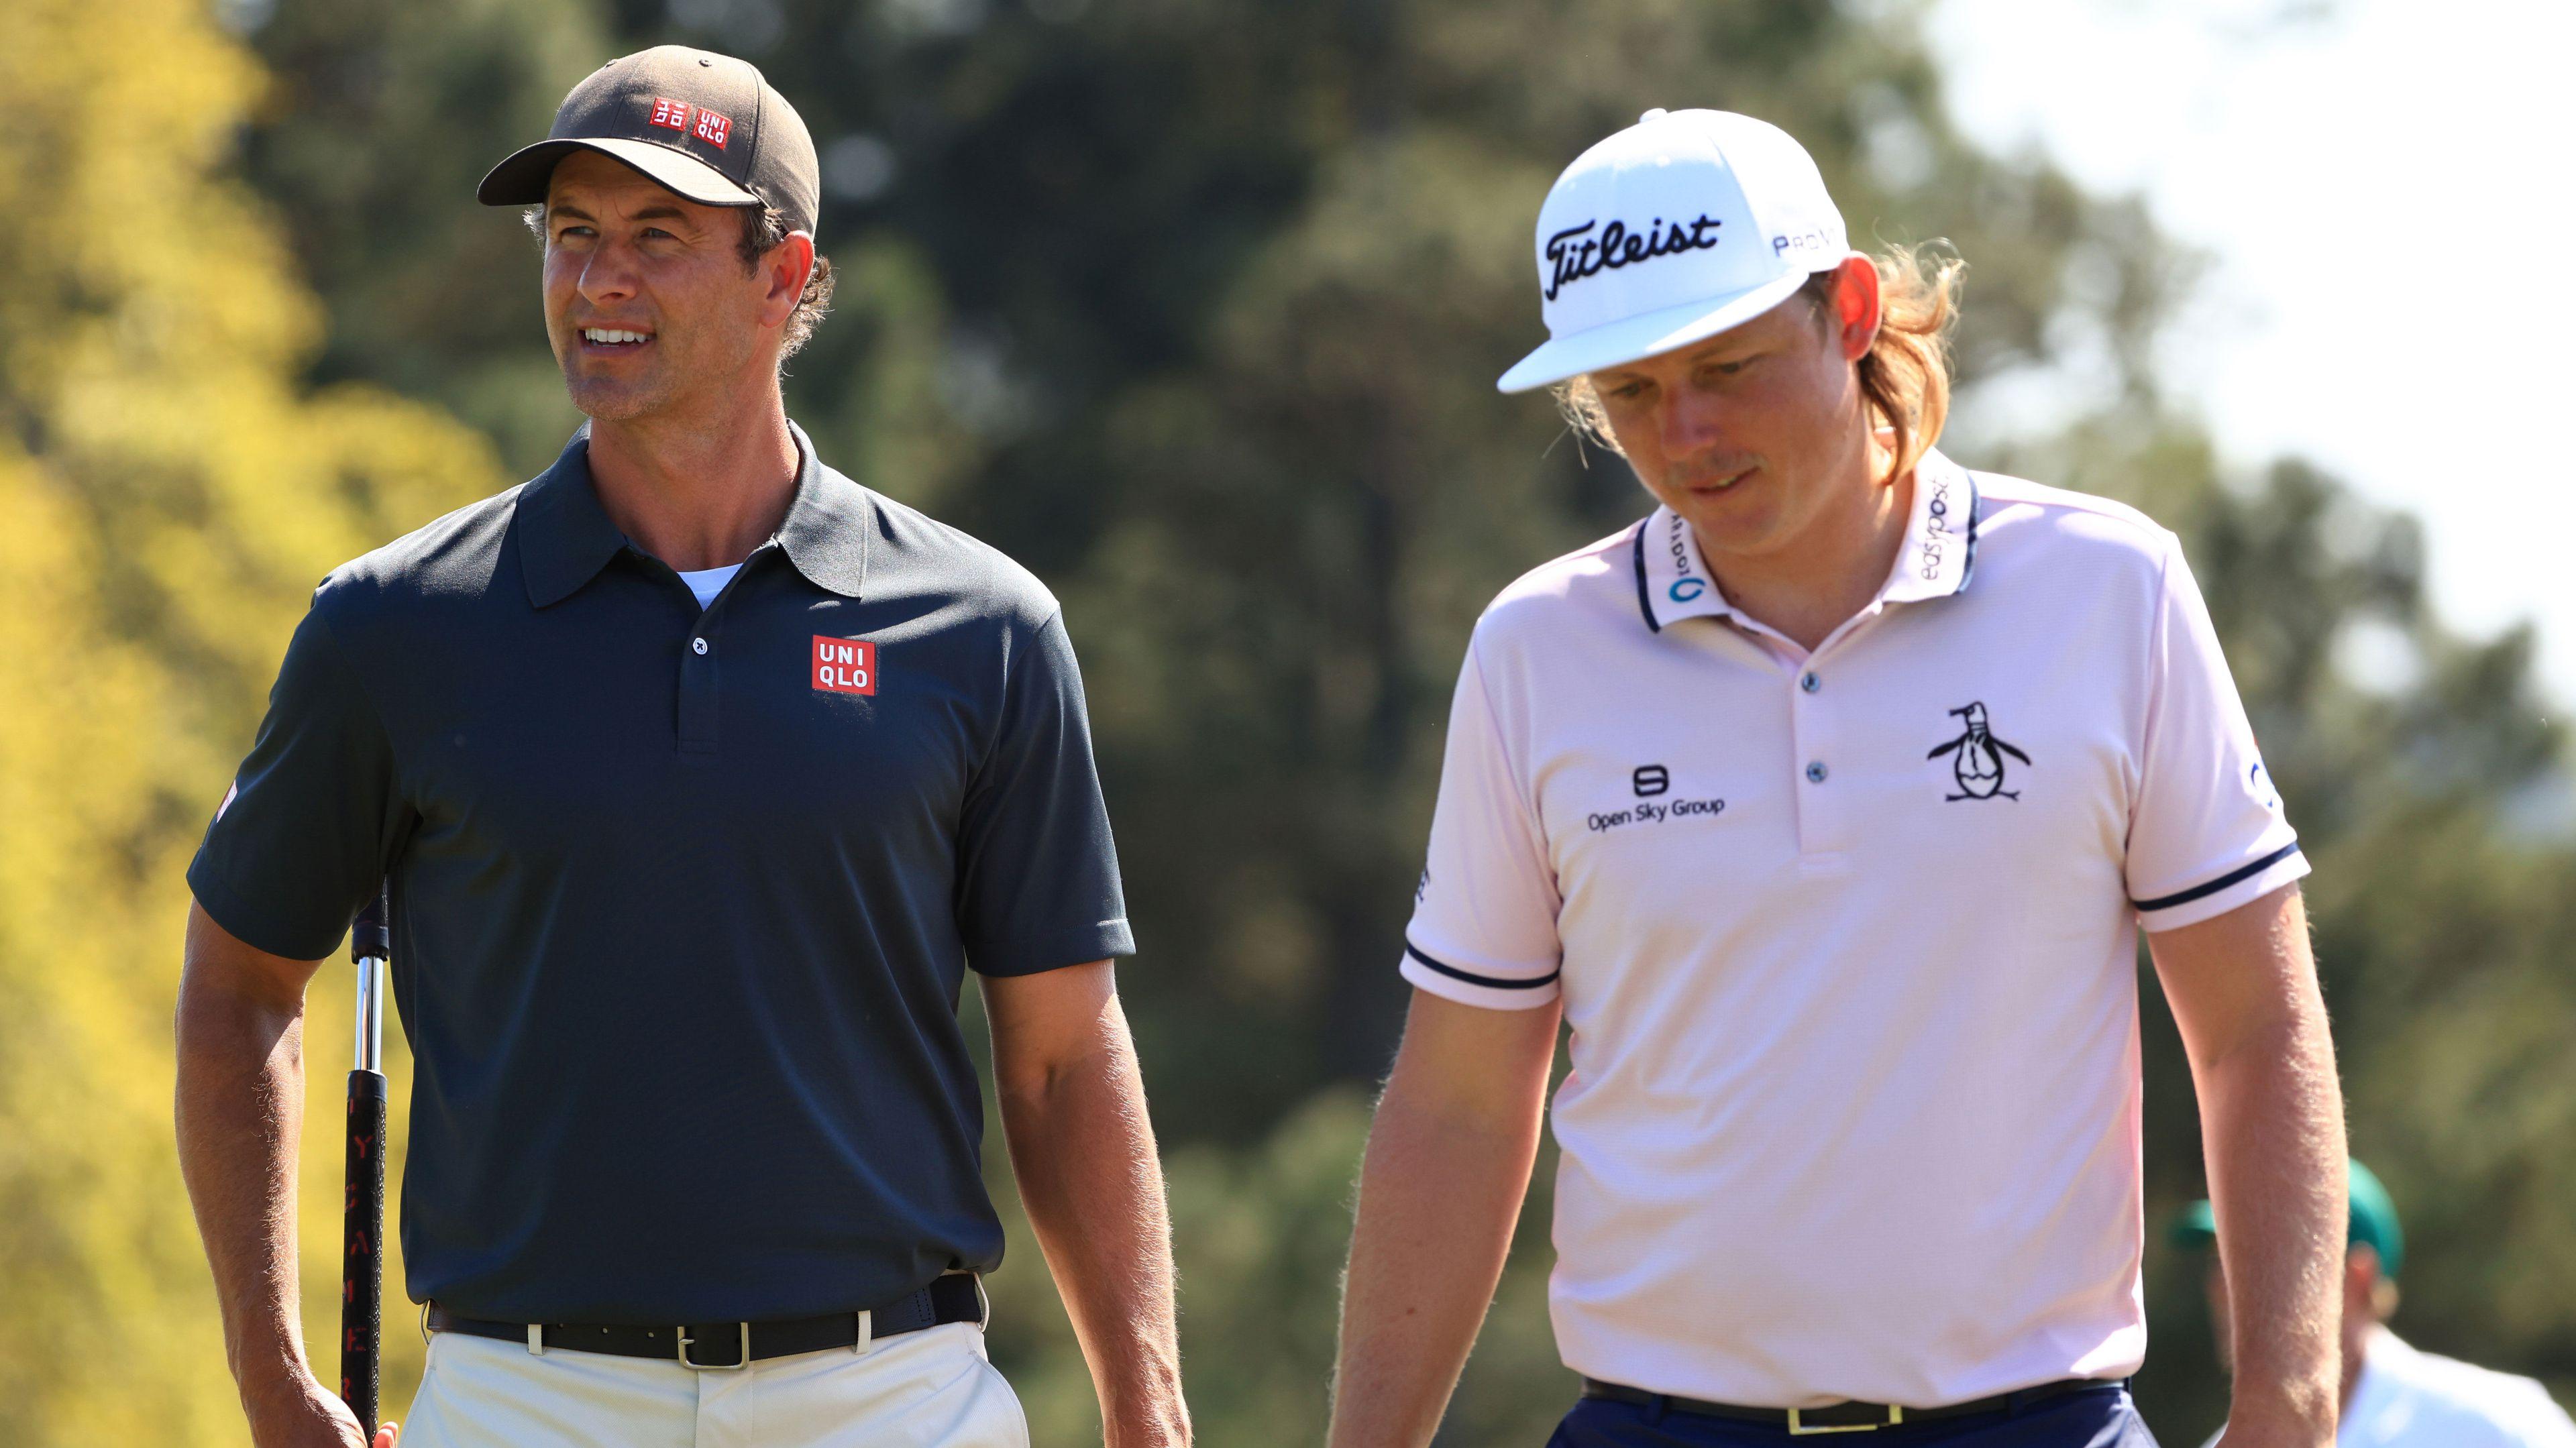 Australian golf stars Adam Scott and Cameron Smith prepare for The Masters.